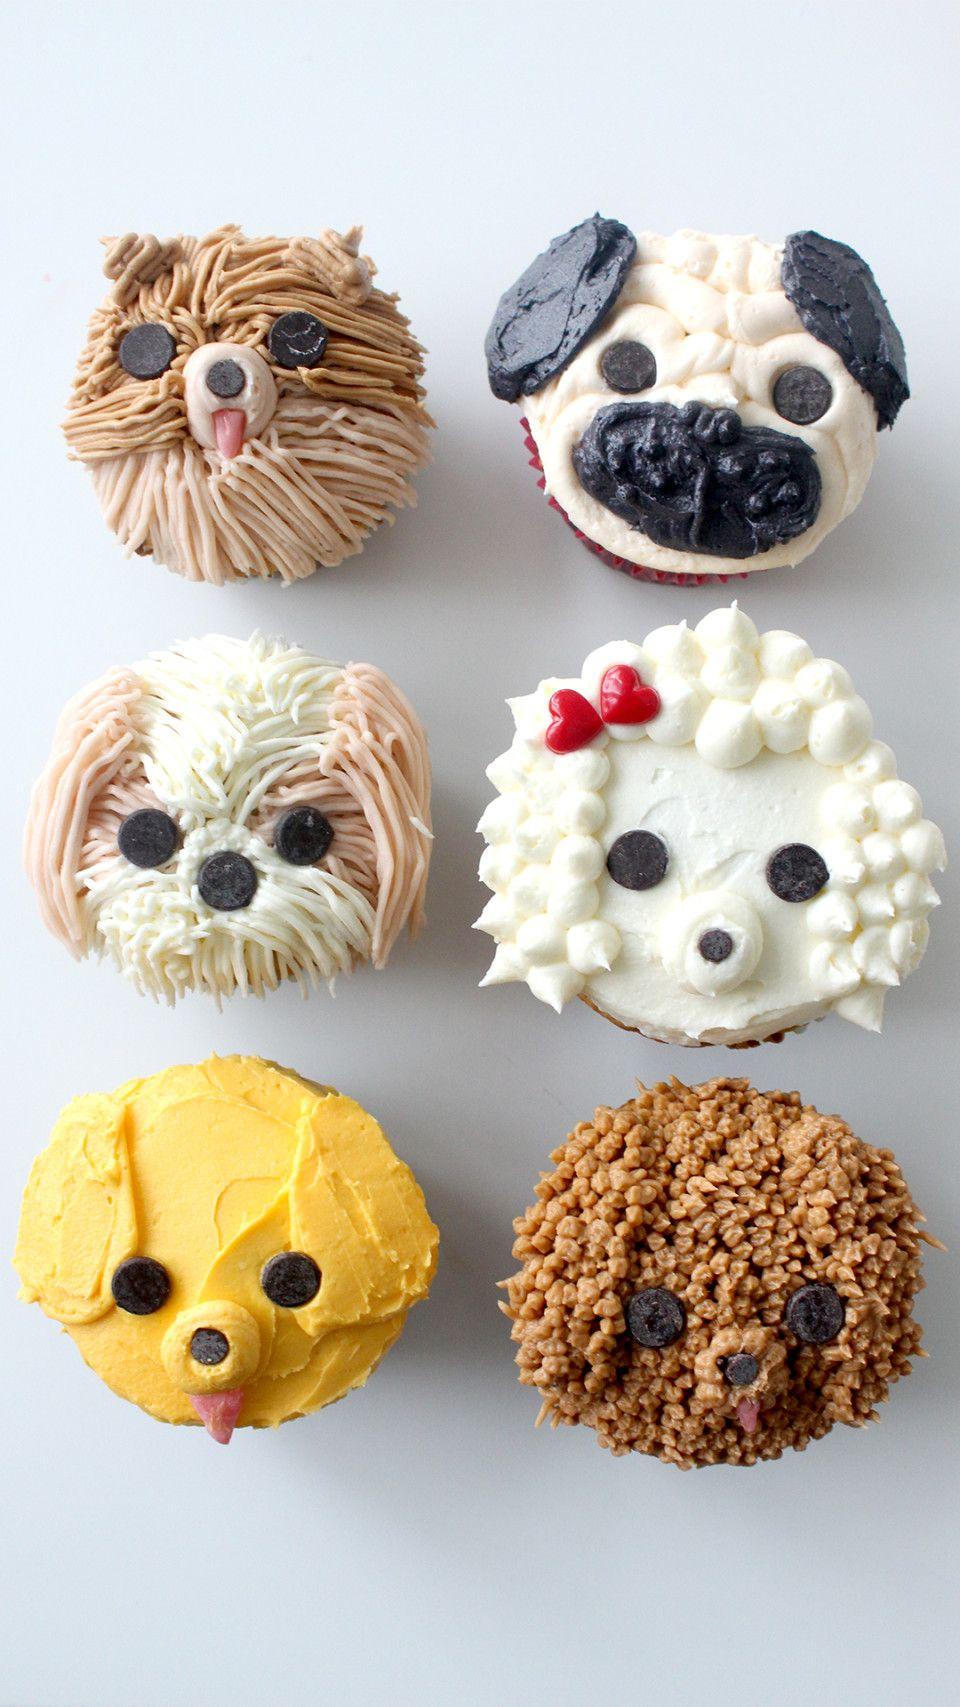 Dog Cupcakes Recipe Cupcake Cupcakes For Dogs Recipe Dog